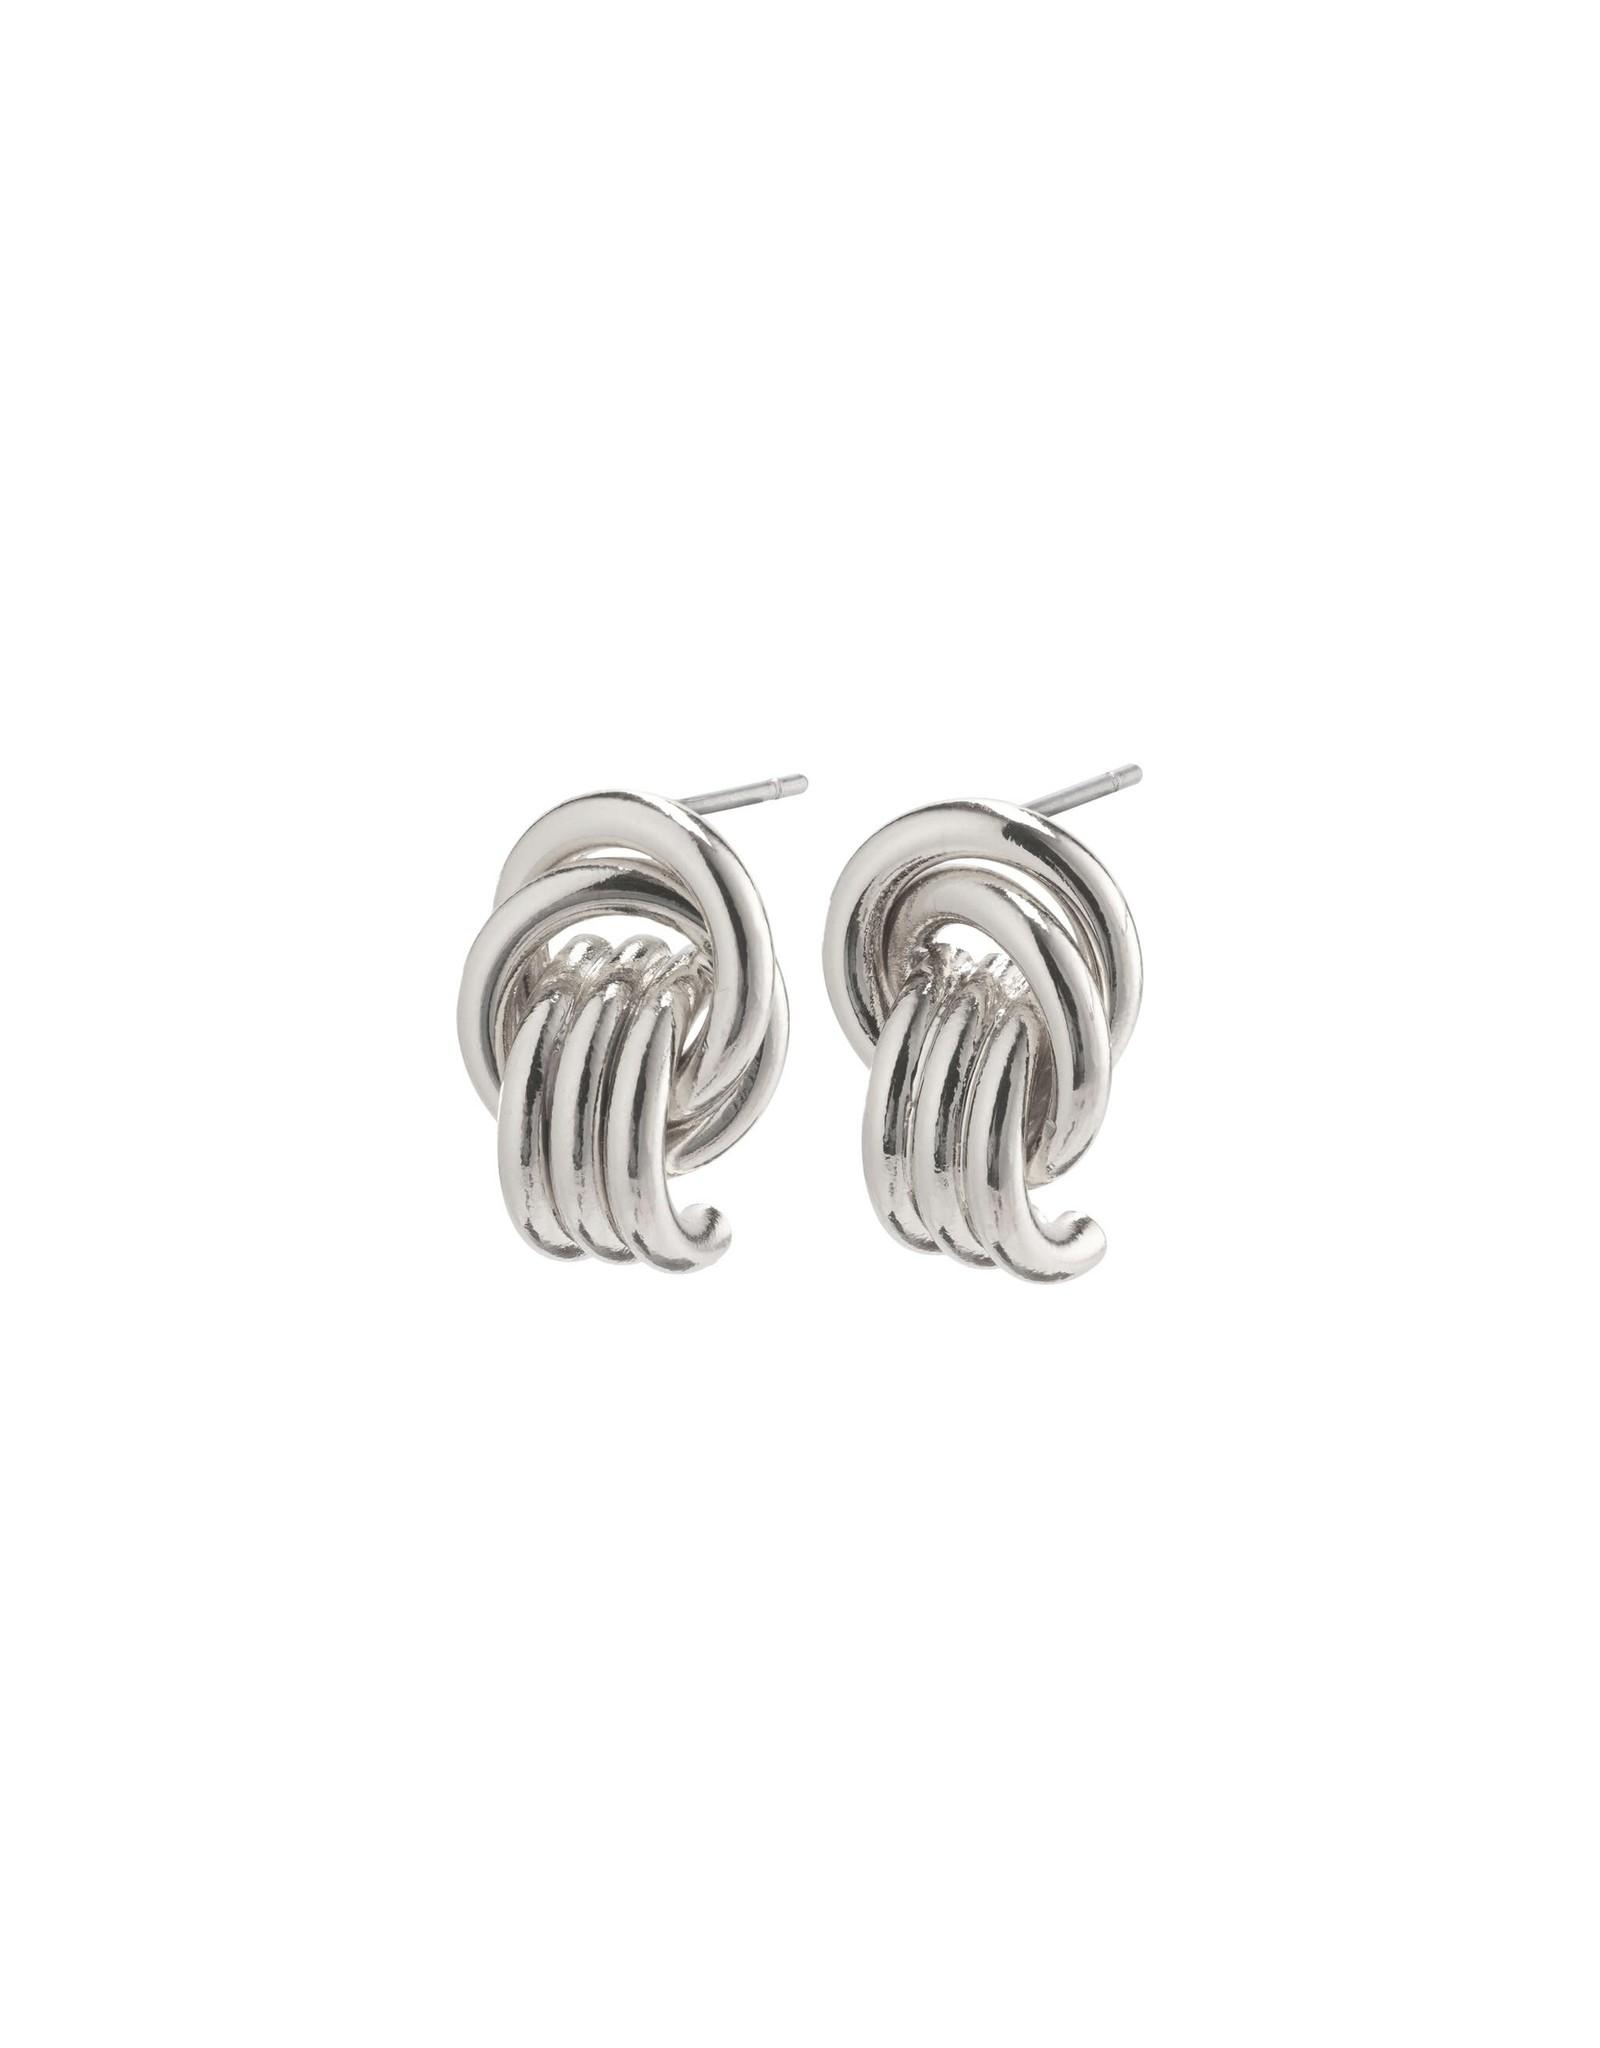 Pilgrim Pilgrim Doris Earrings Silver Plated